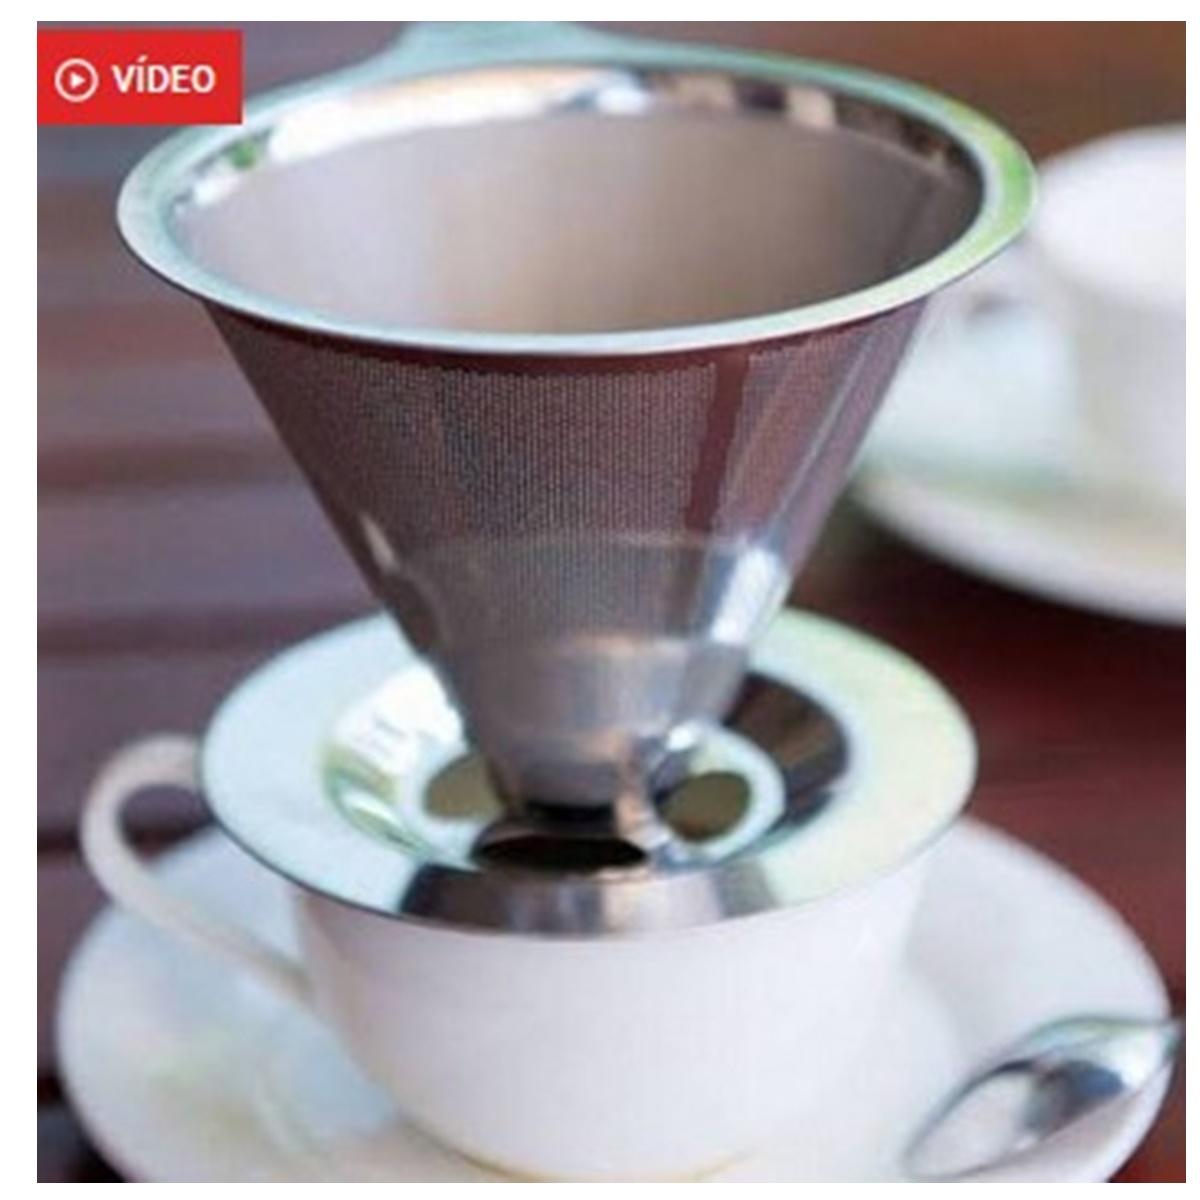 Filtro Coador de Café Inox Camada Dupla Ke Home - 6792